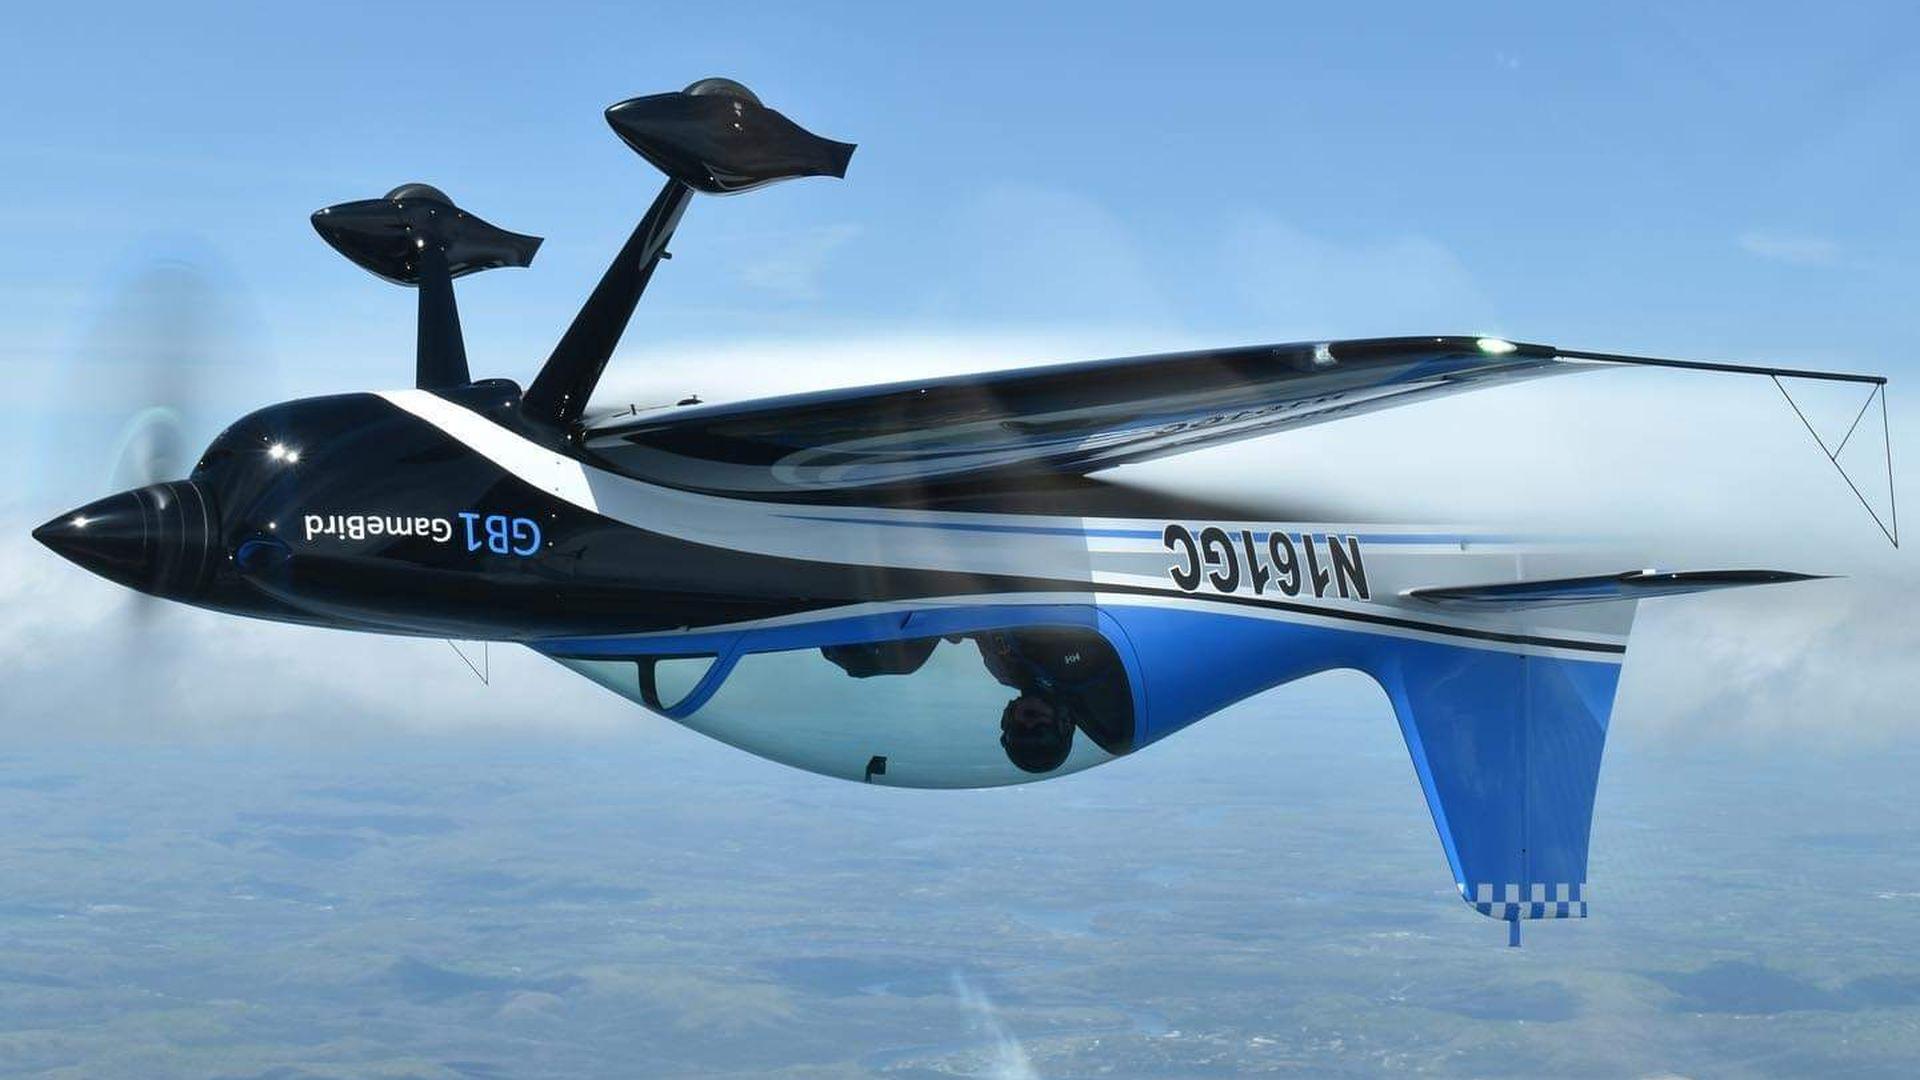 A GameBird 1 stunt plane flies upside down.